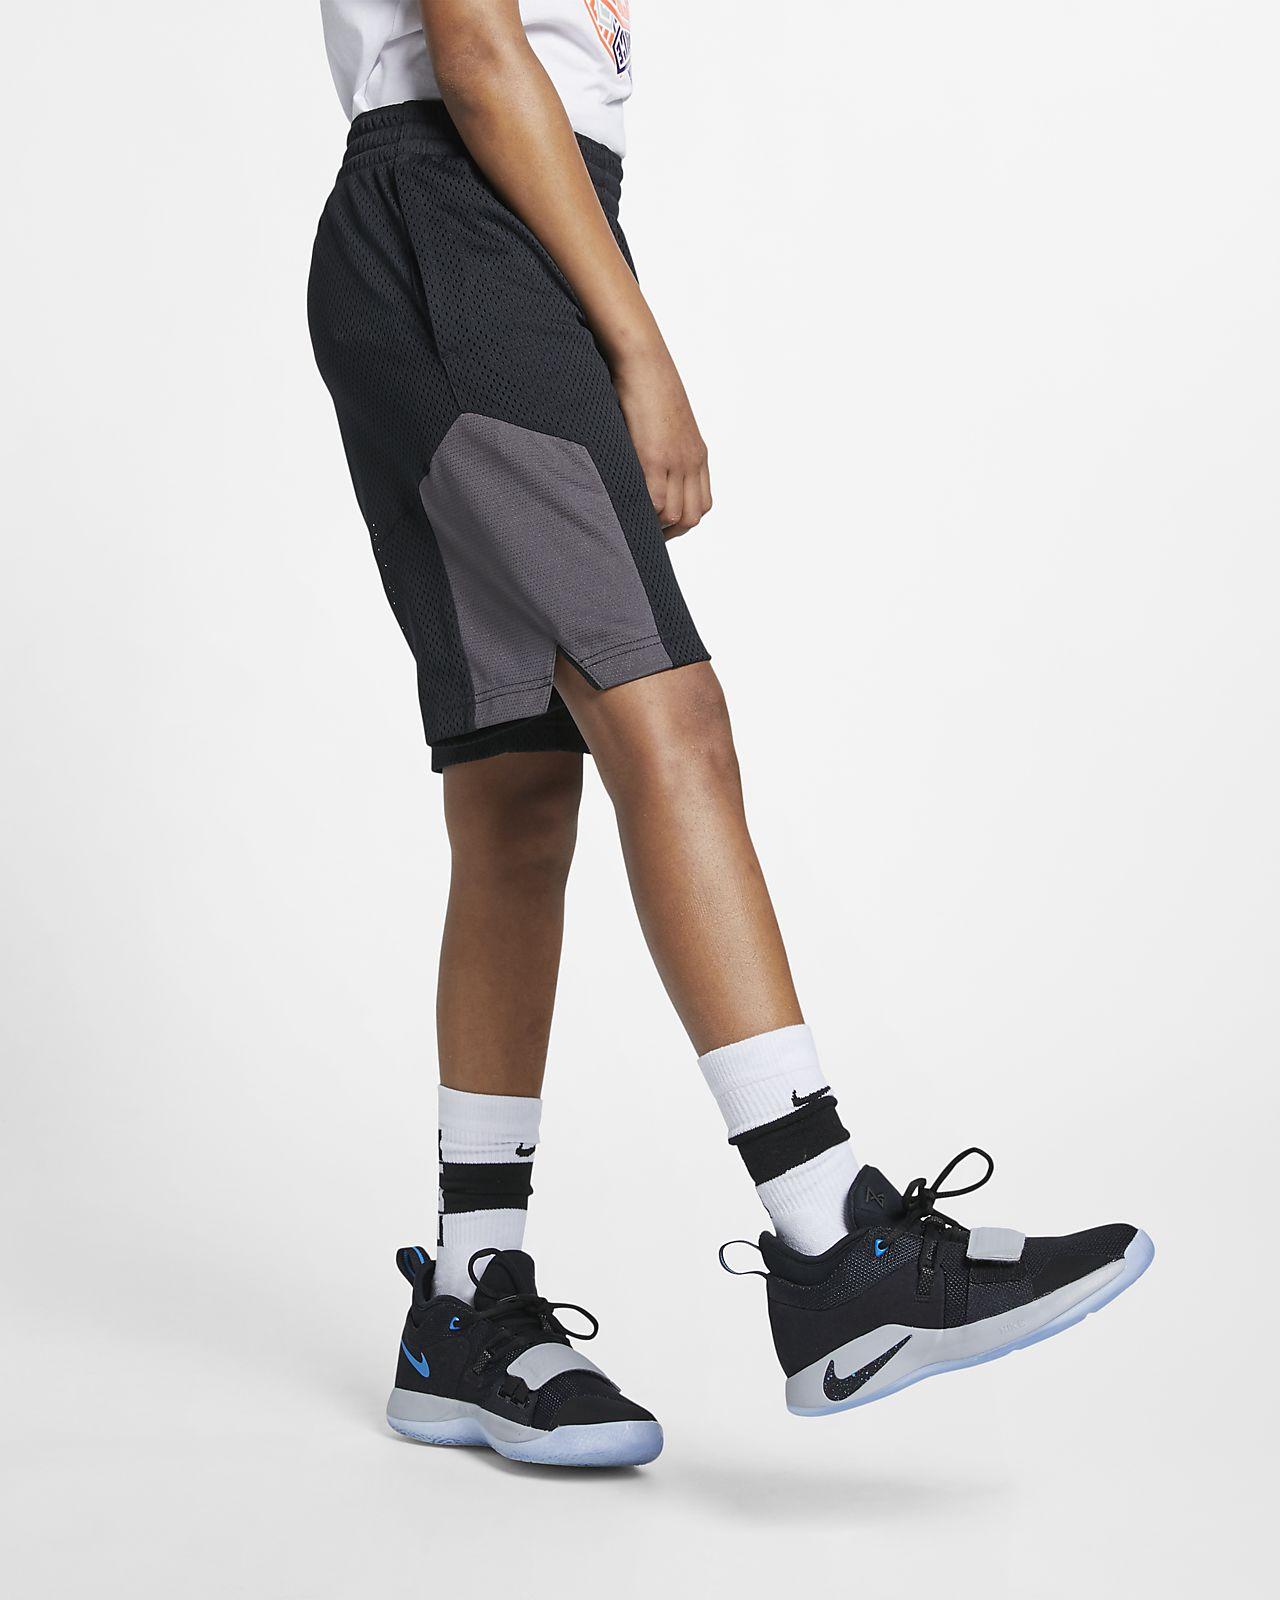 Kyrie Big Kids' (Boys') Basketball Shorts